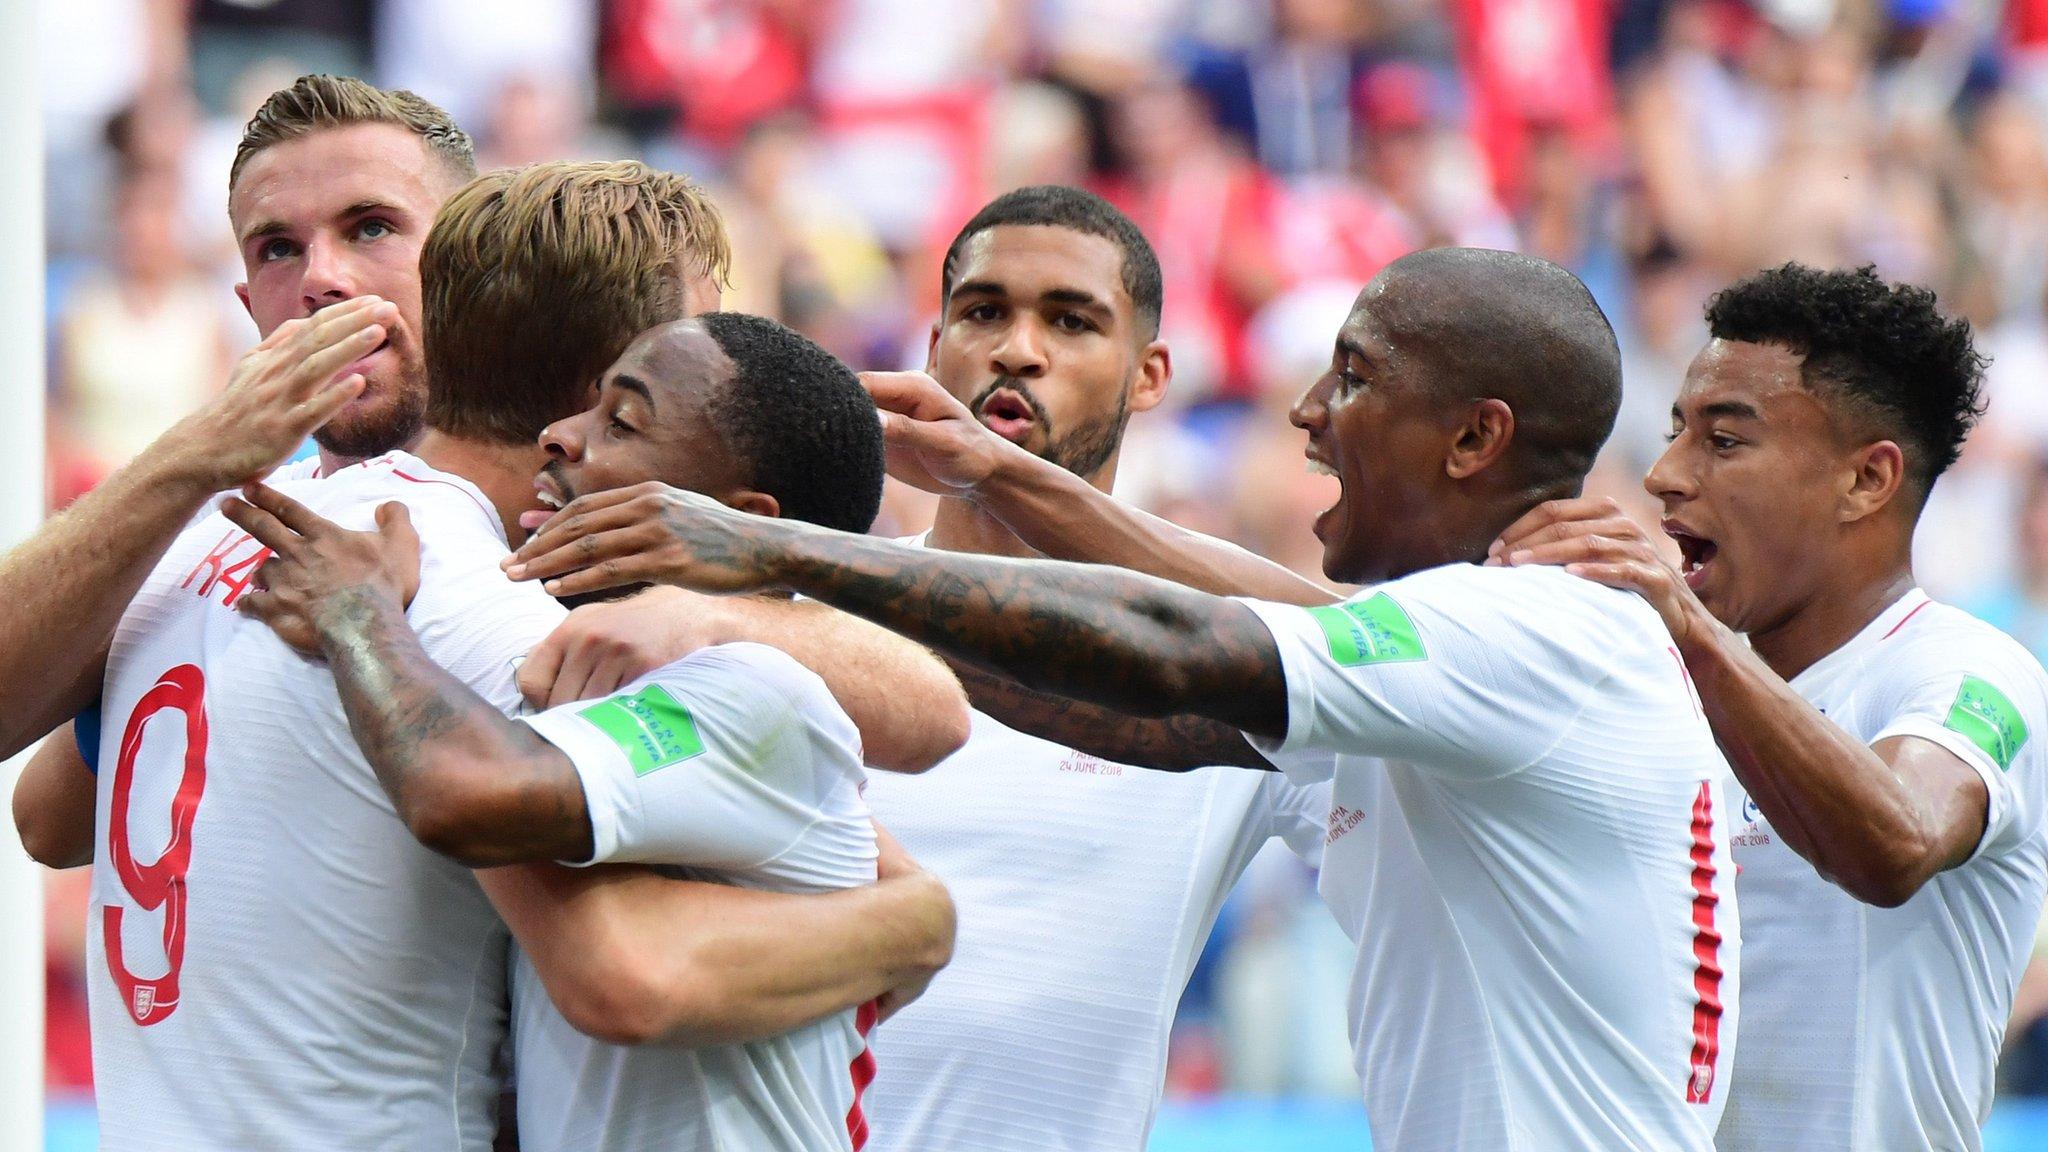 England-Panama draws 82.9% peak TV audience share